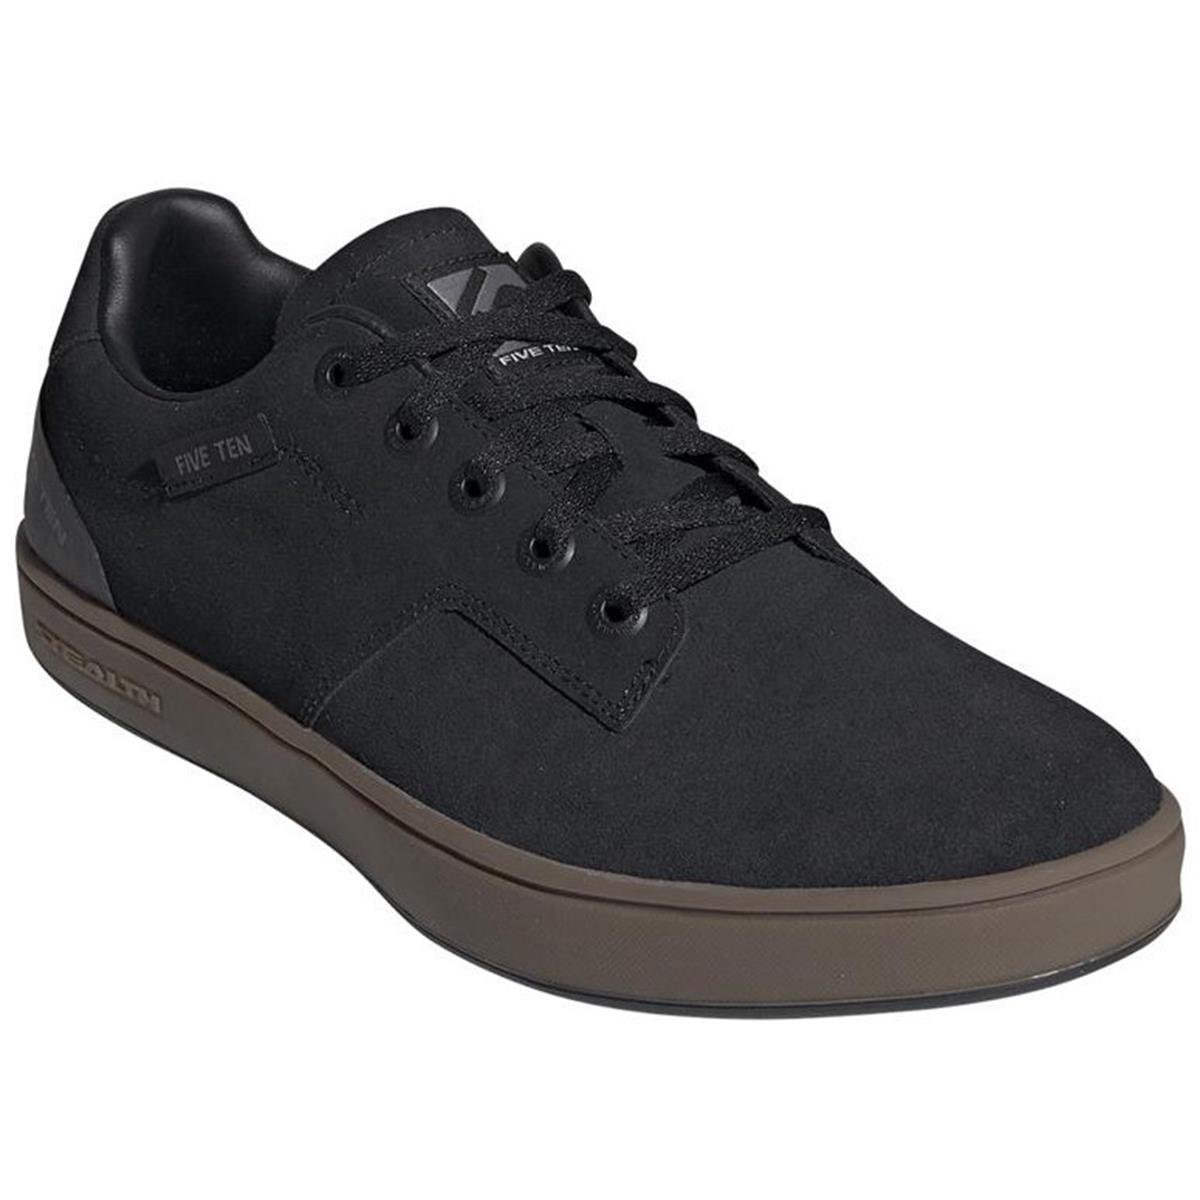 Five Ten MTB-Schuhe Sleuth Core Black/Core Black/Gold Met.